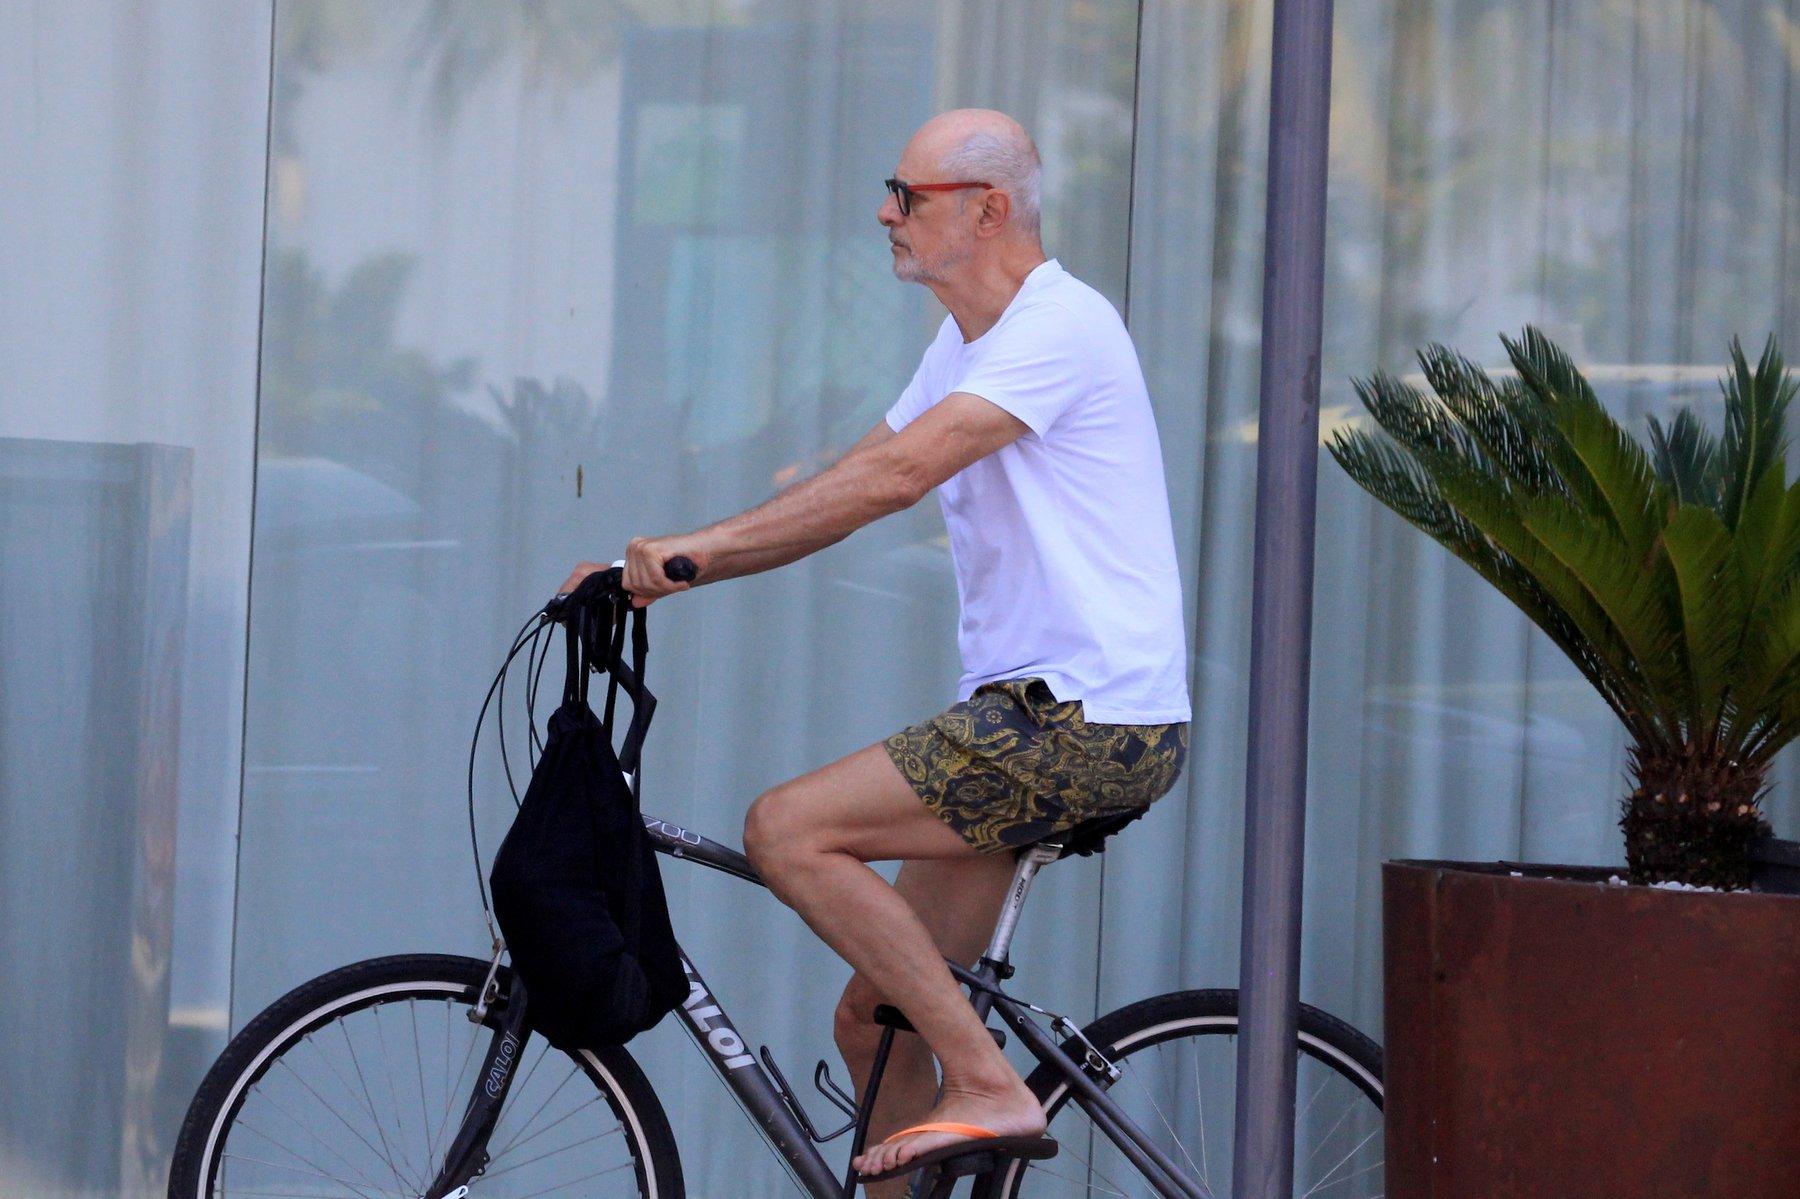 No grupo de risco do coronavírus, Marcos Caruso passeia de bicicleta pelo Rio de Janeiro